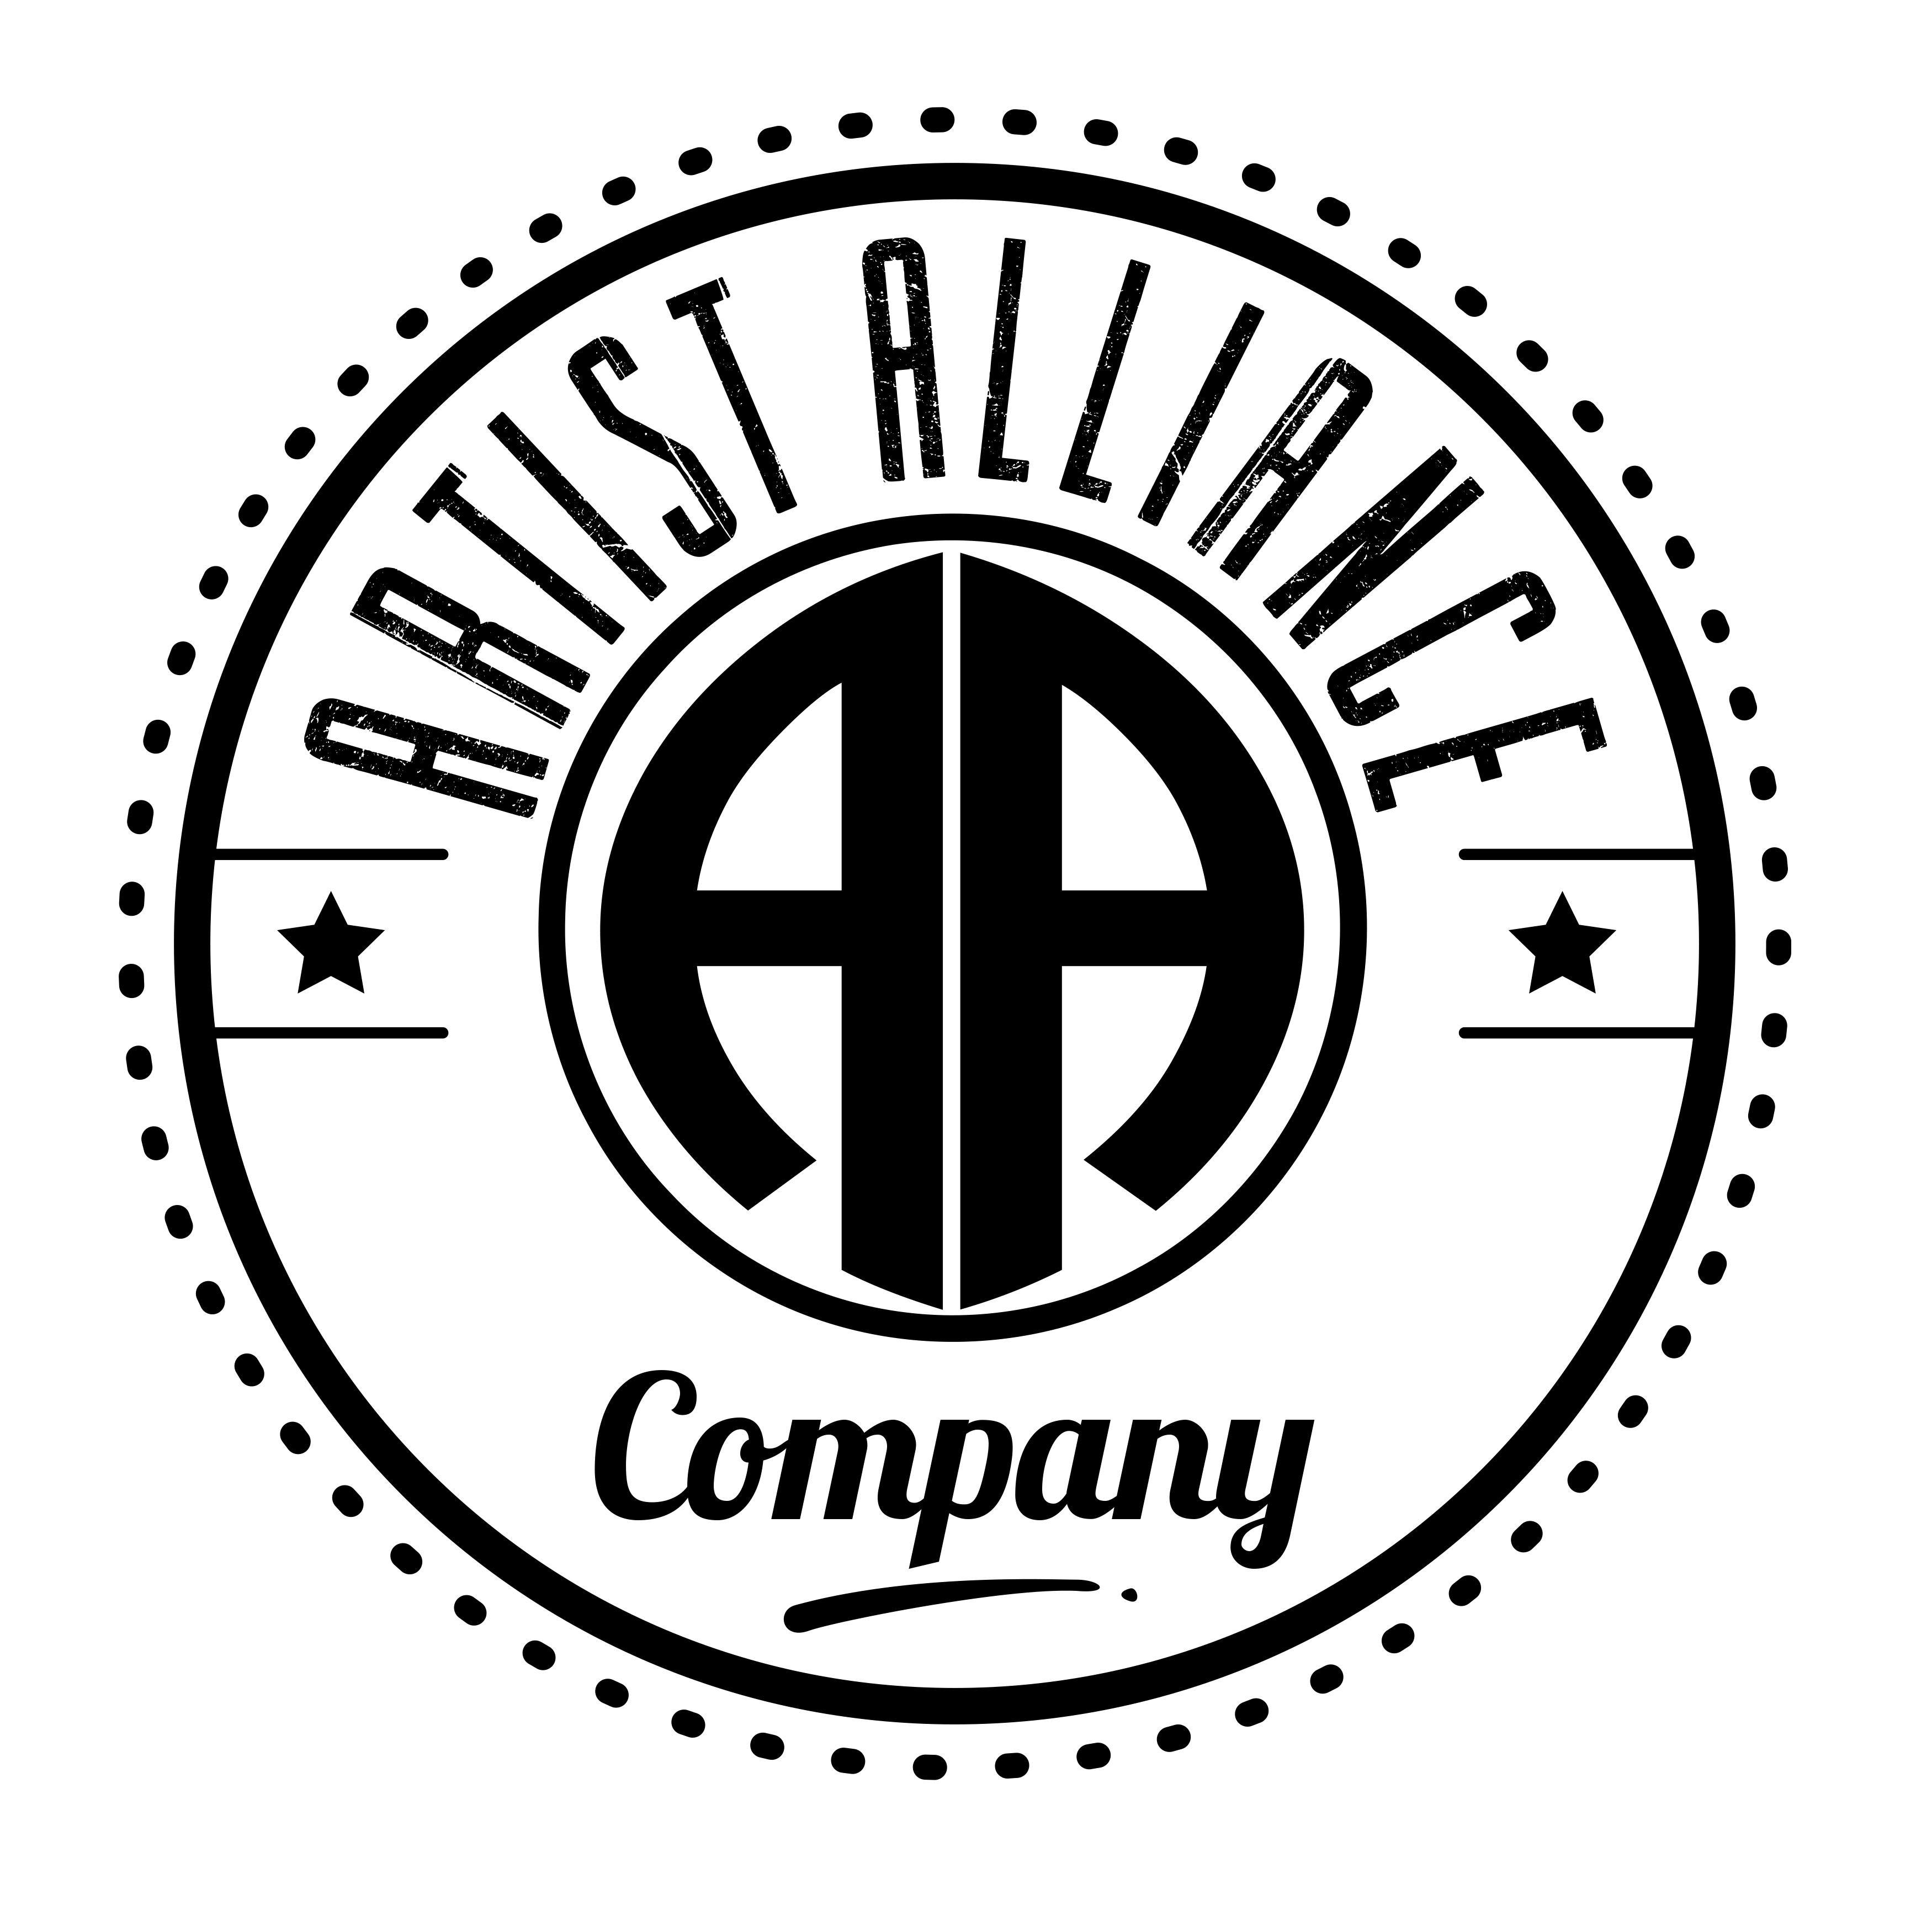 The Artist Alliance Company Inc